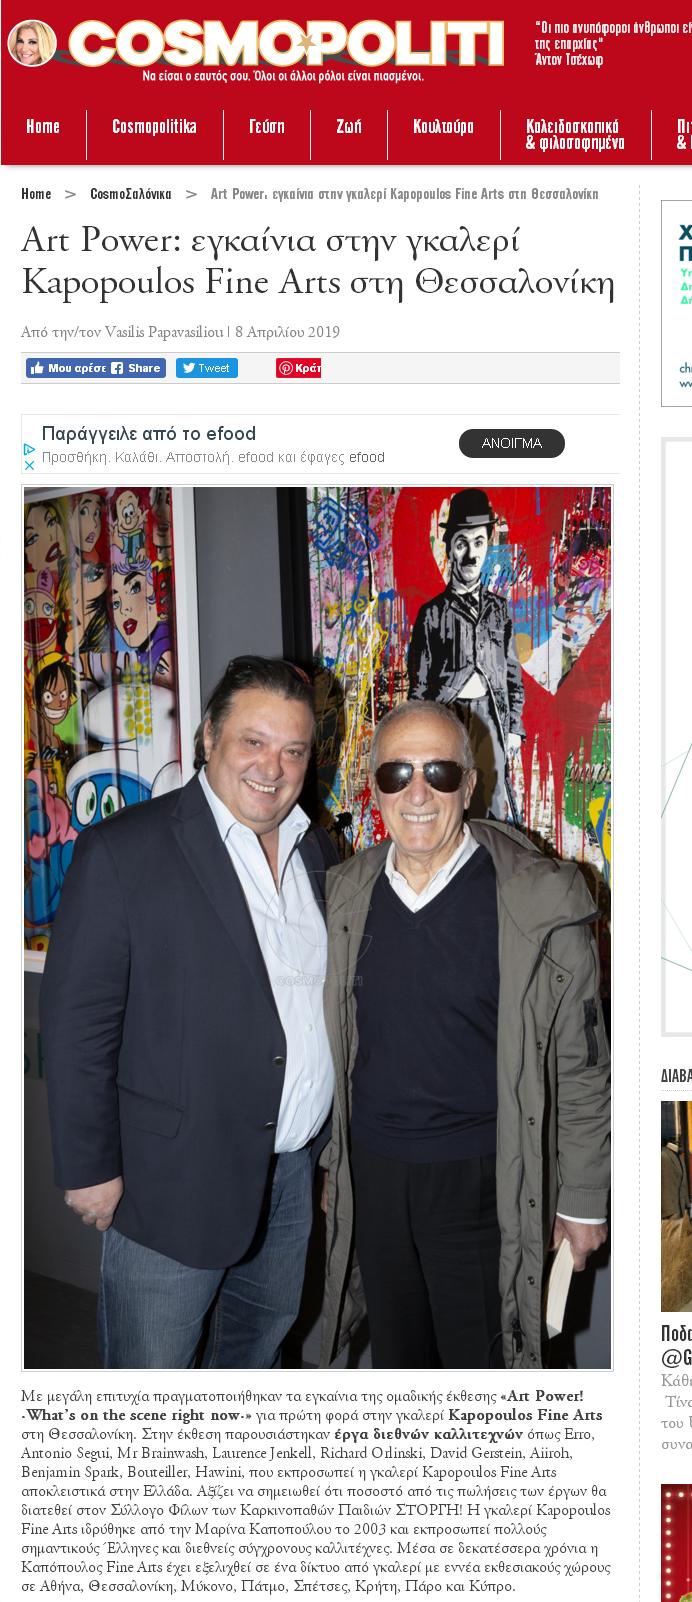 Kapopoulos Fine Arts Εγκαίνια Έκθεσης «Art Power! ·What's on the scene right now·»